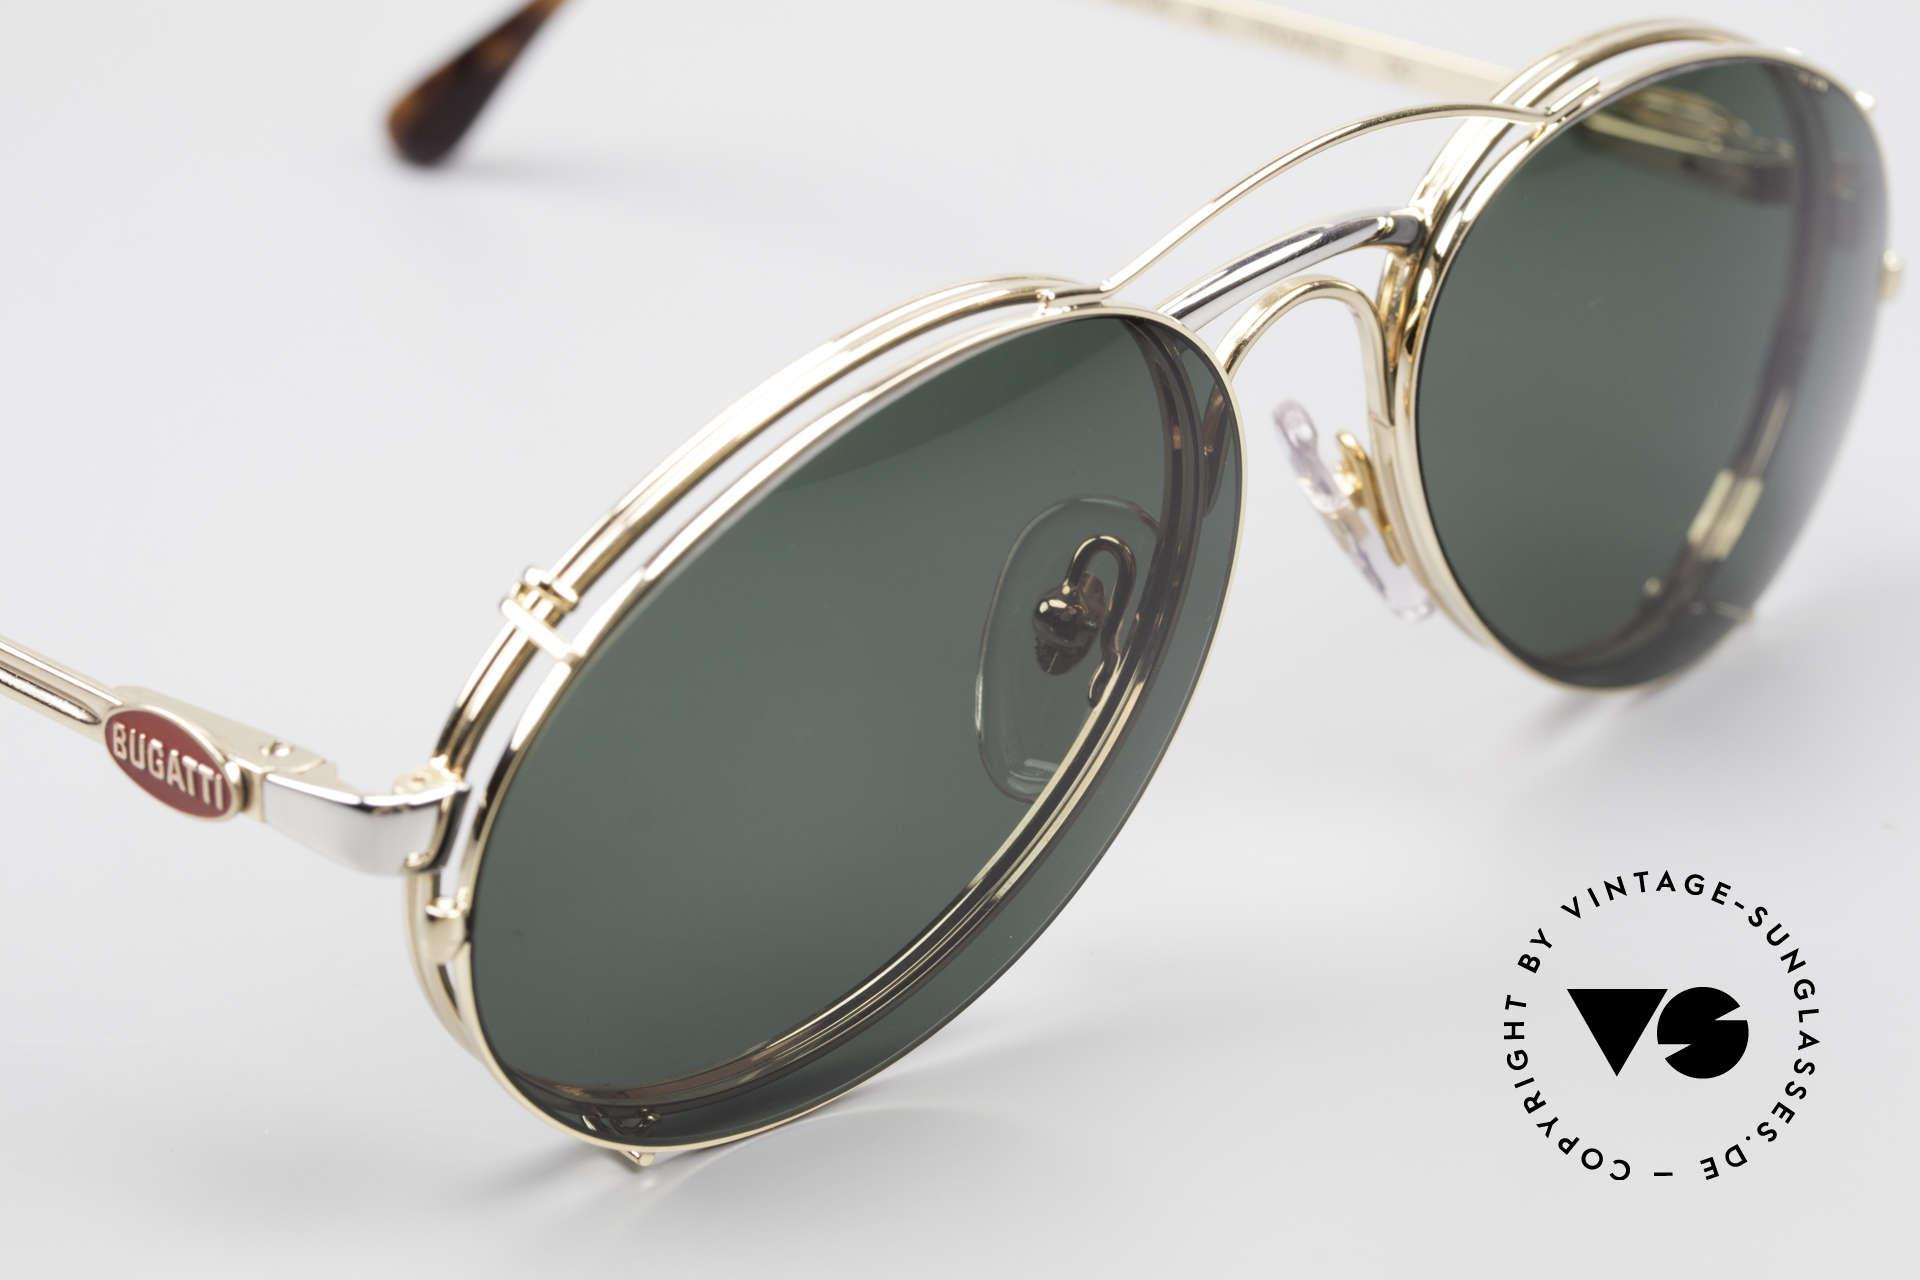 Bugatti 03308 Men's 80's Glasses With Clip On, unworn (like all our vintage Bugatti designer shades), Made for Men